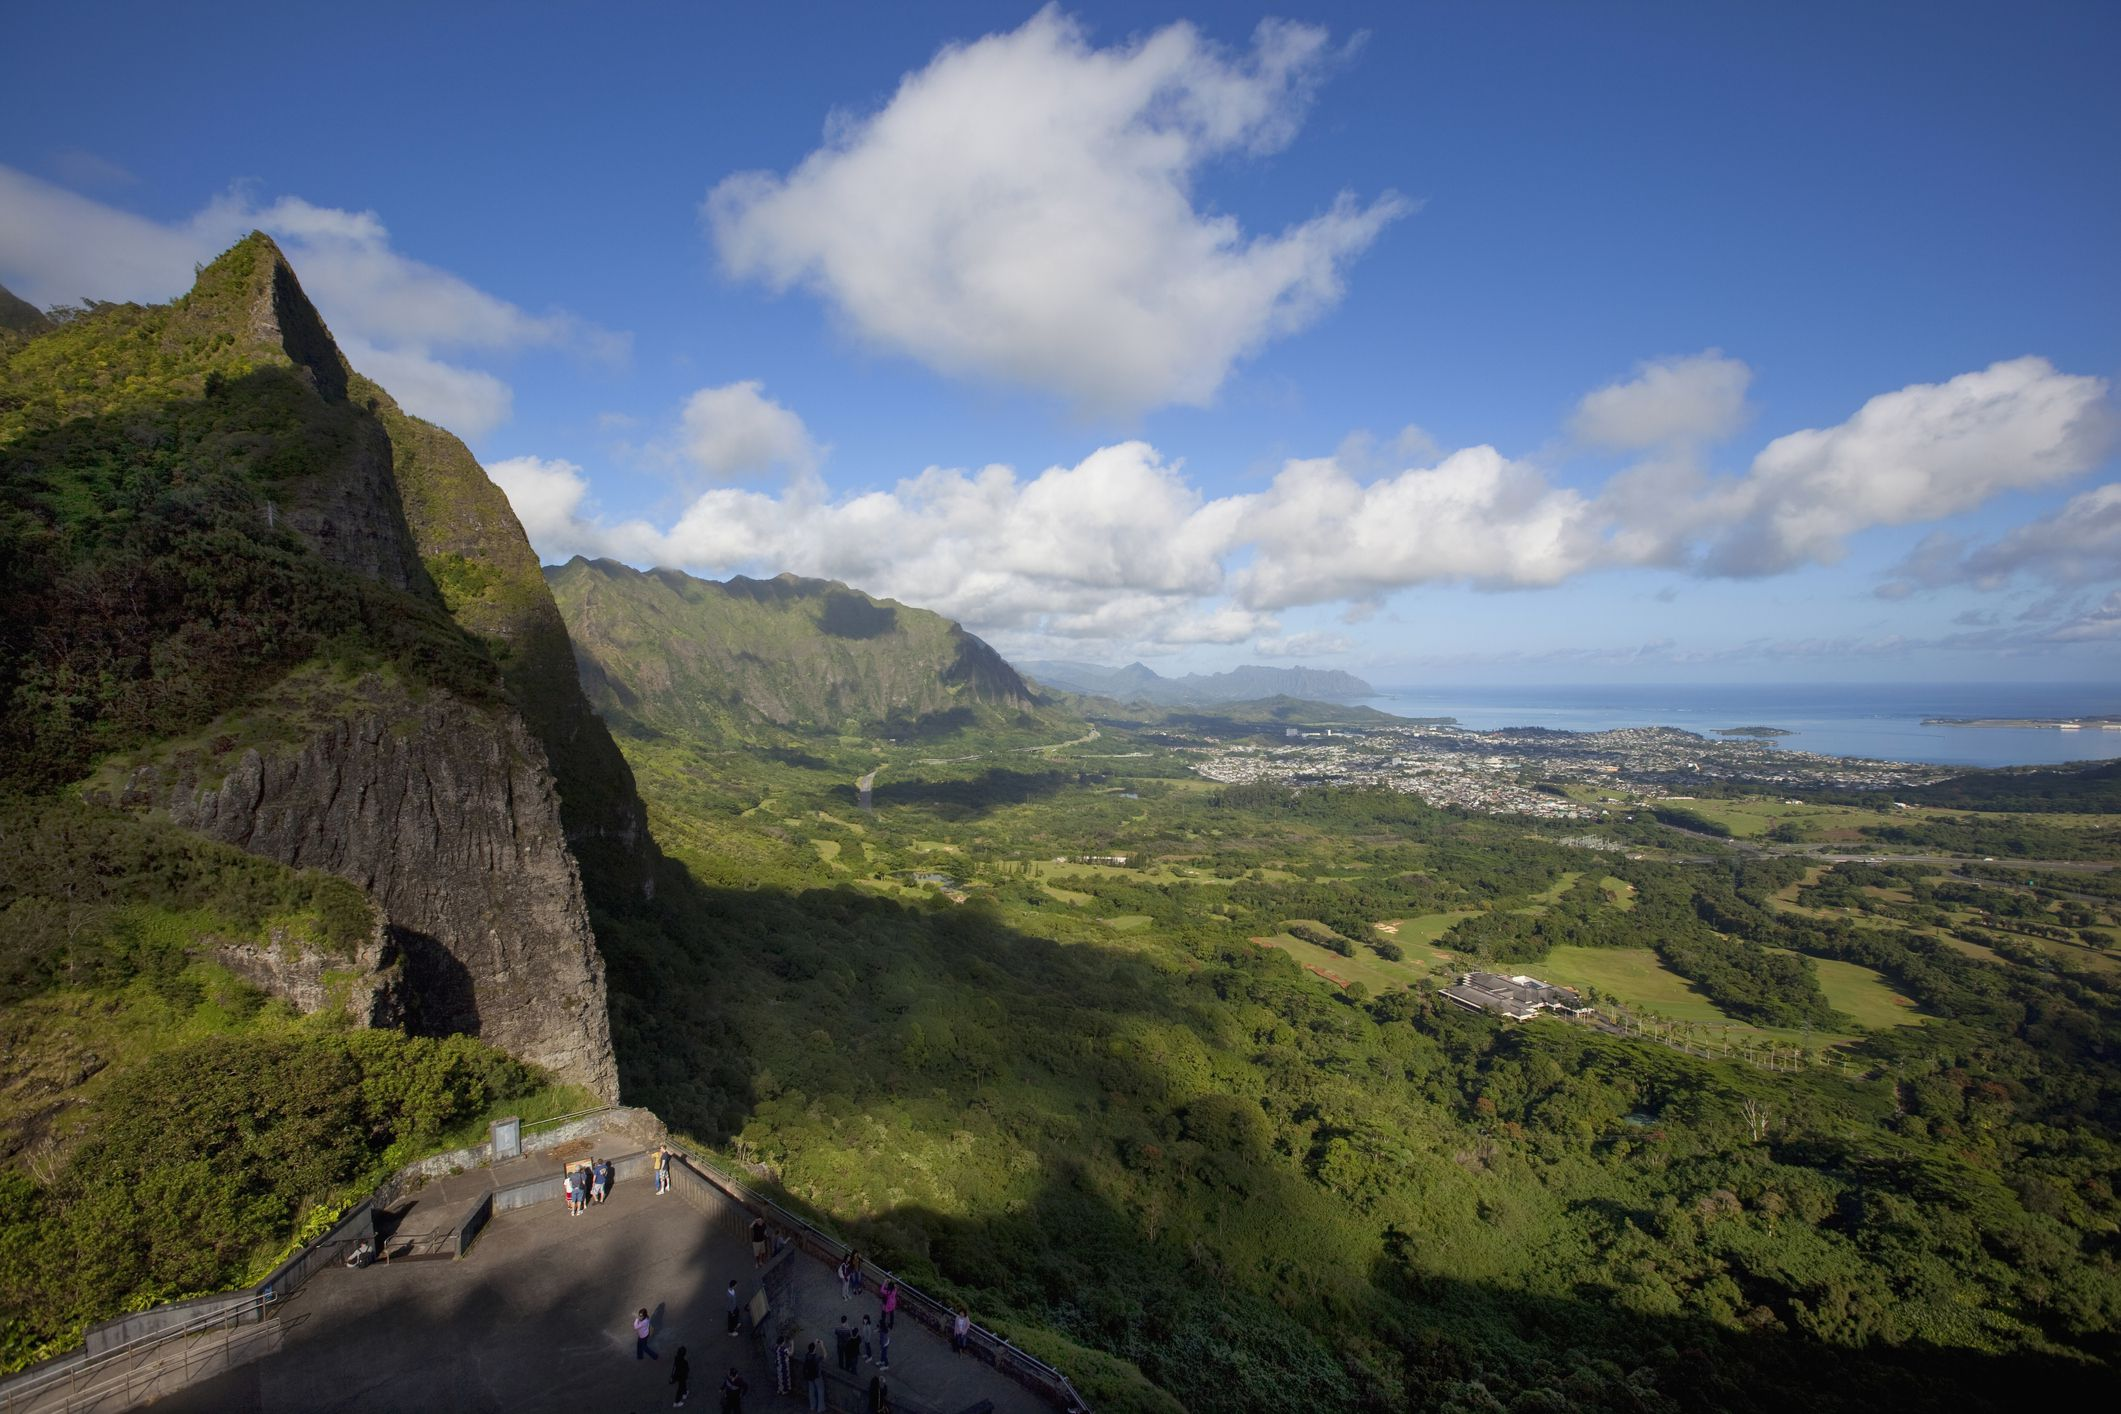 Daytrip To The Windward Coast Of The Island Of Oahu Hawaii